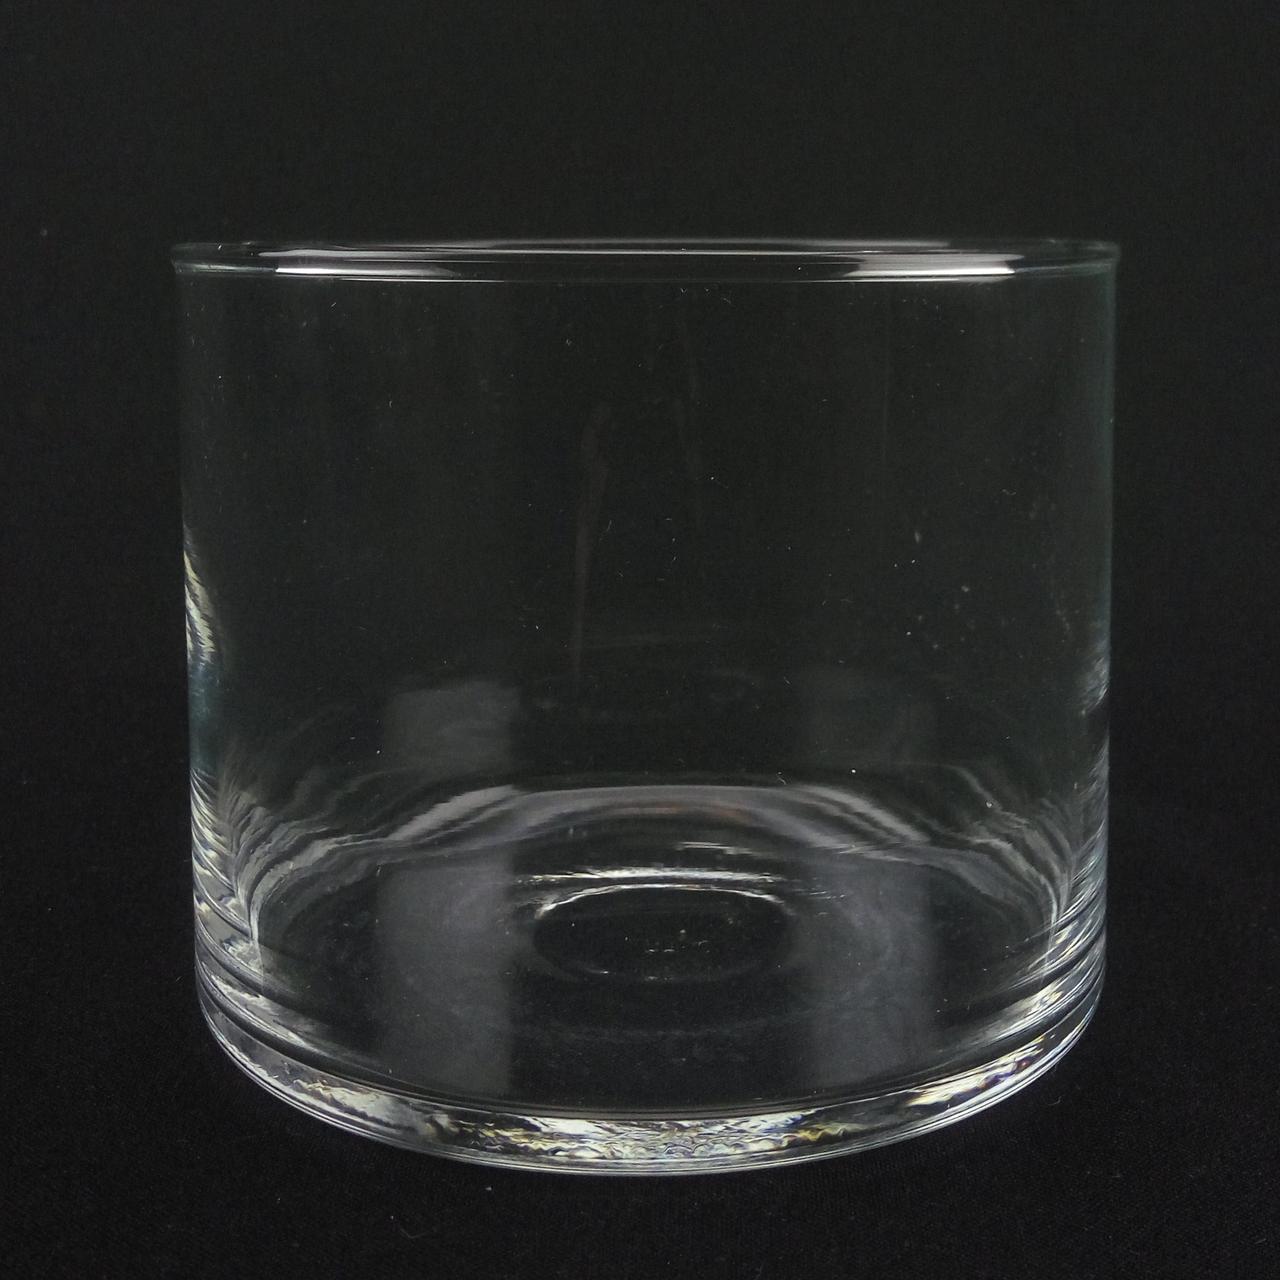 Подсвечник h 10 см, Ø 12 см, колба